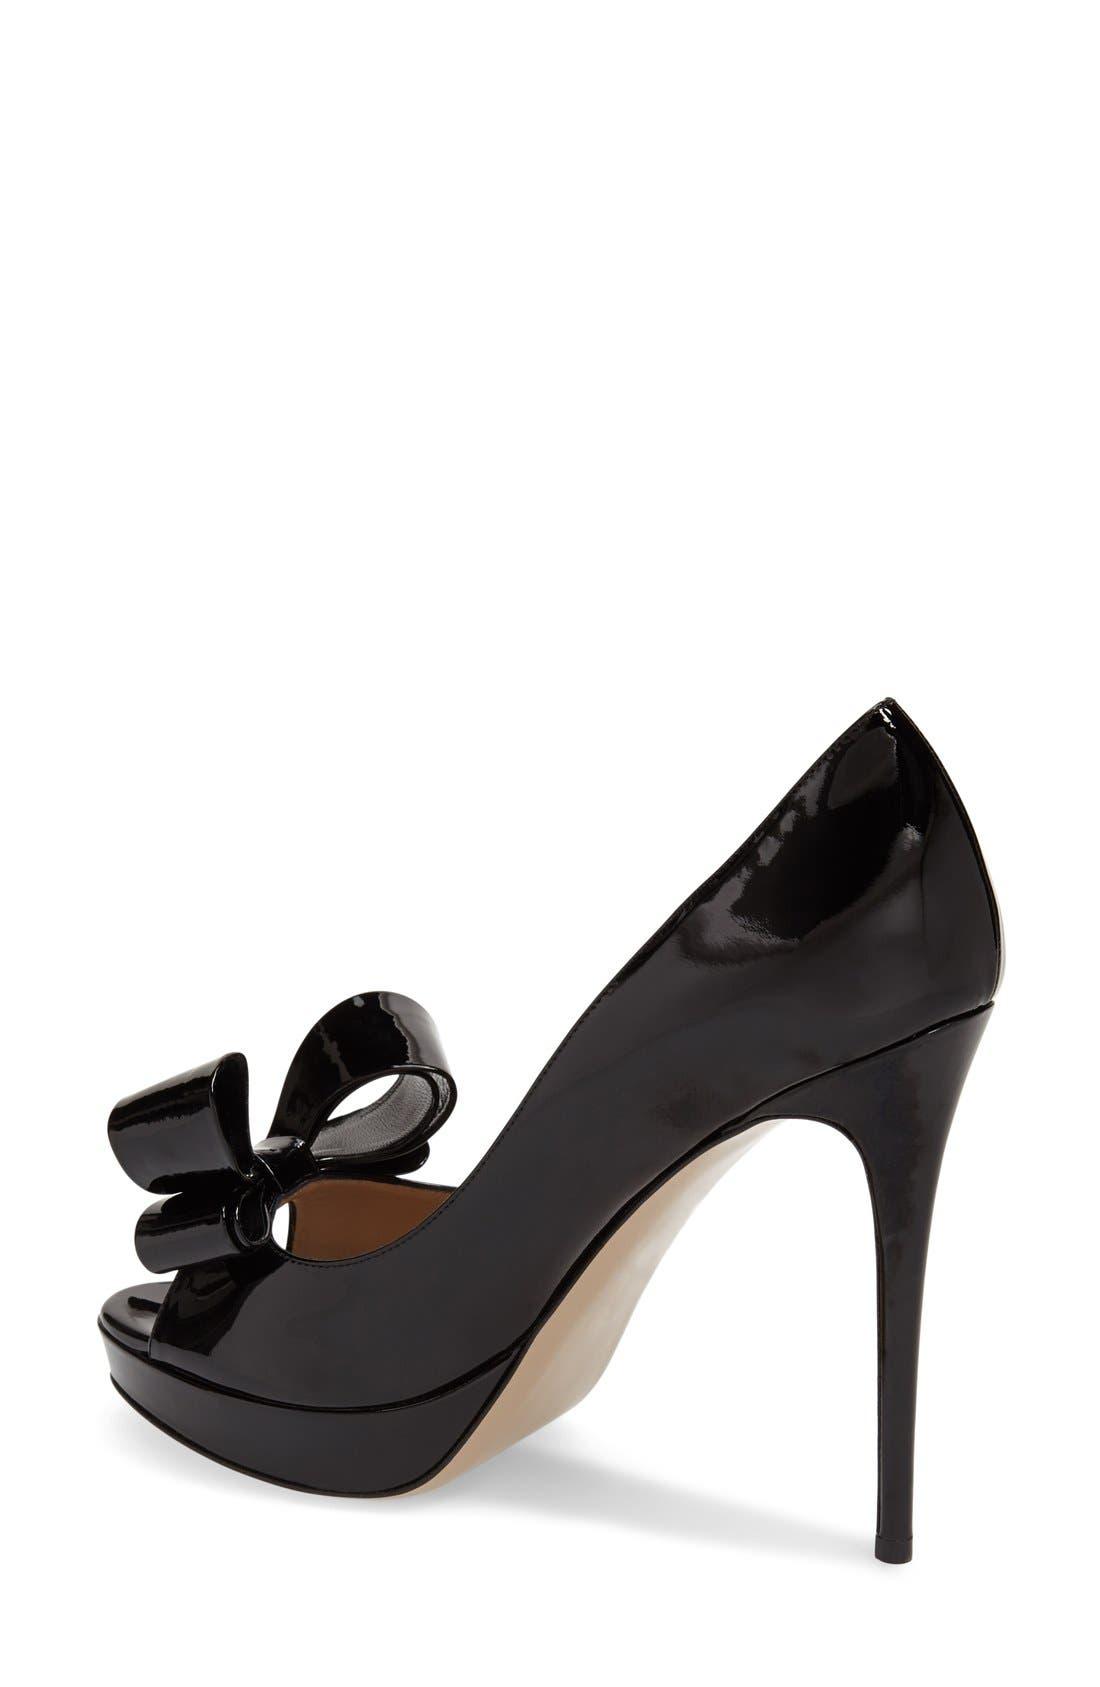 VALENTINO GARAVANI,                             Couture Bow Platform Pump,                             Alternate thumbnail 5, color,                             001